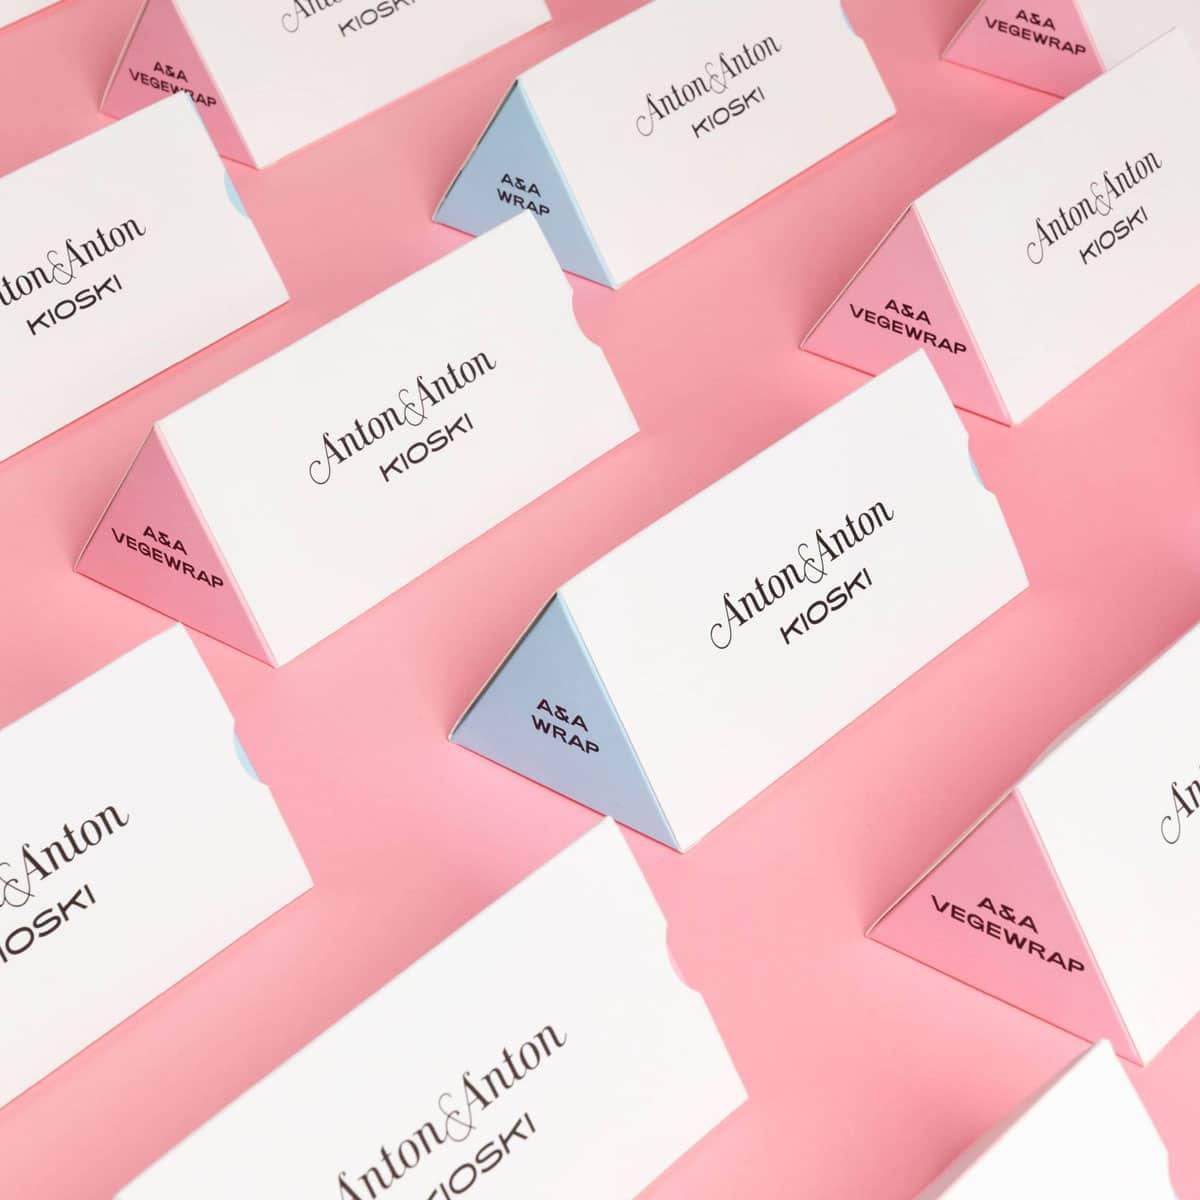 Anton & Anton packaging from Framme & Bond